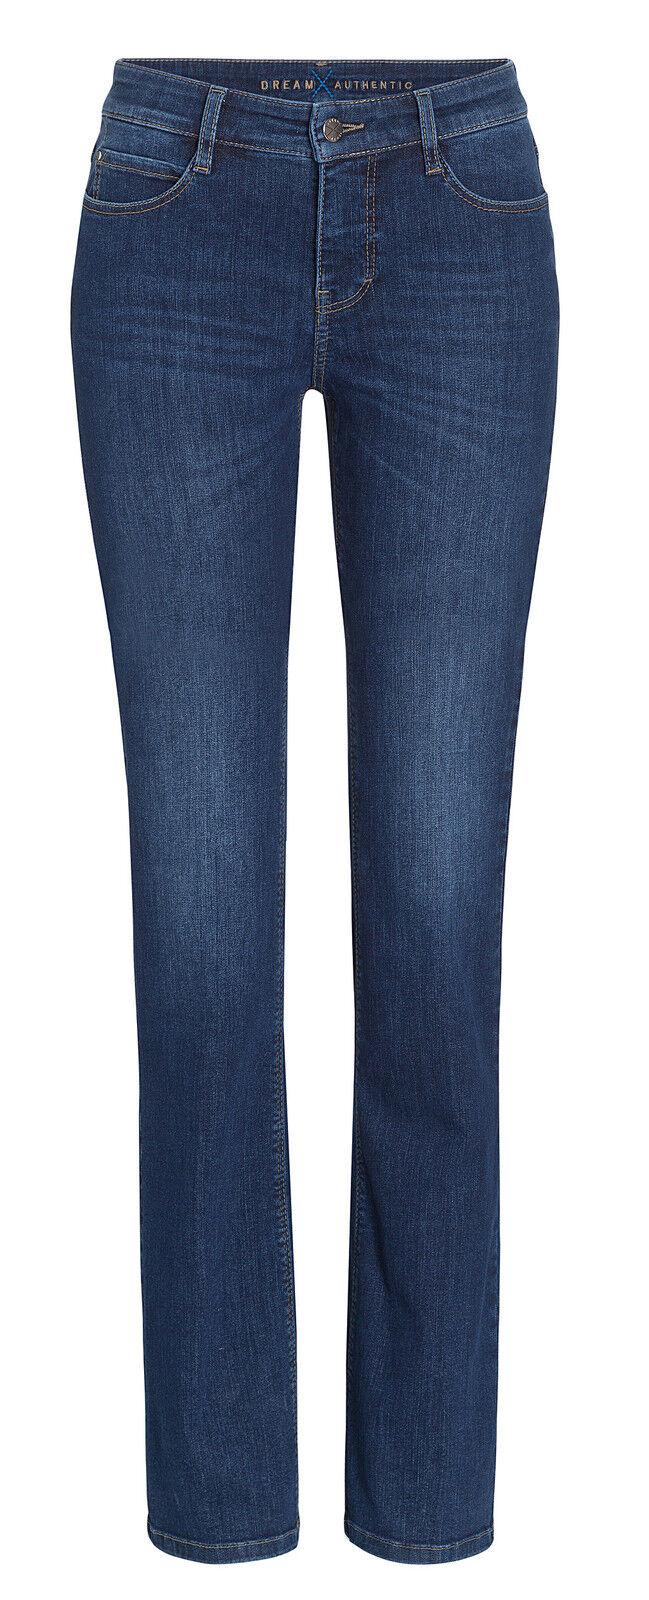 MAC Damen Jeans Dream Flarot 5412 dark Blau fresh use D873 Ver. Größen Längen